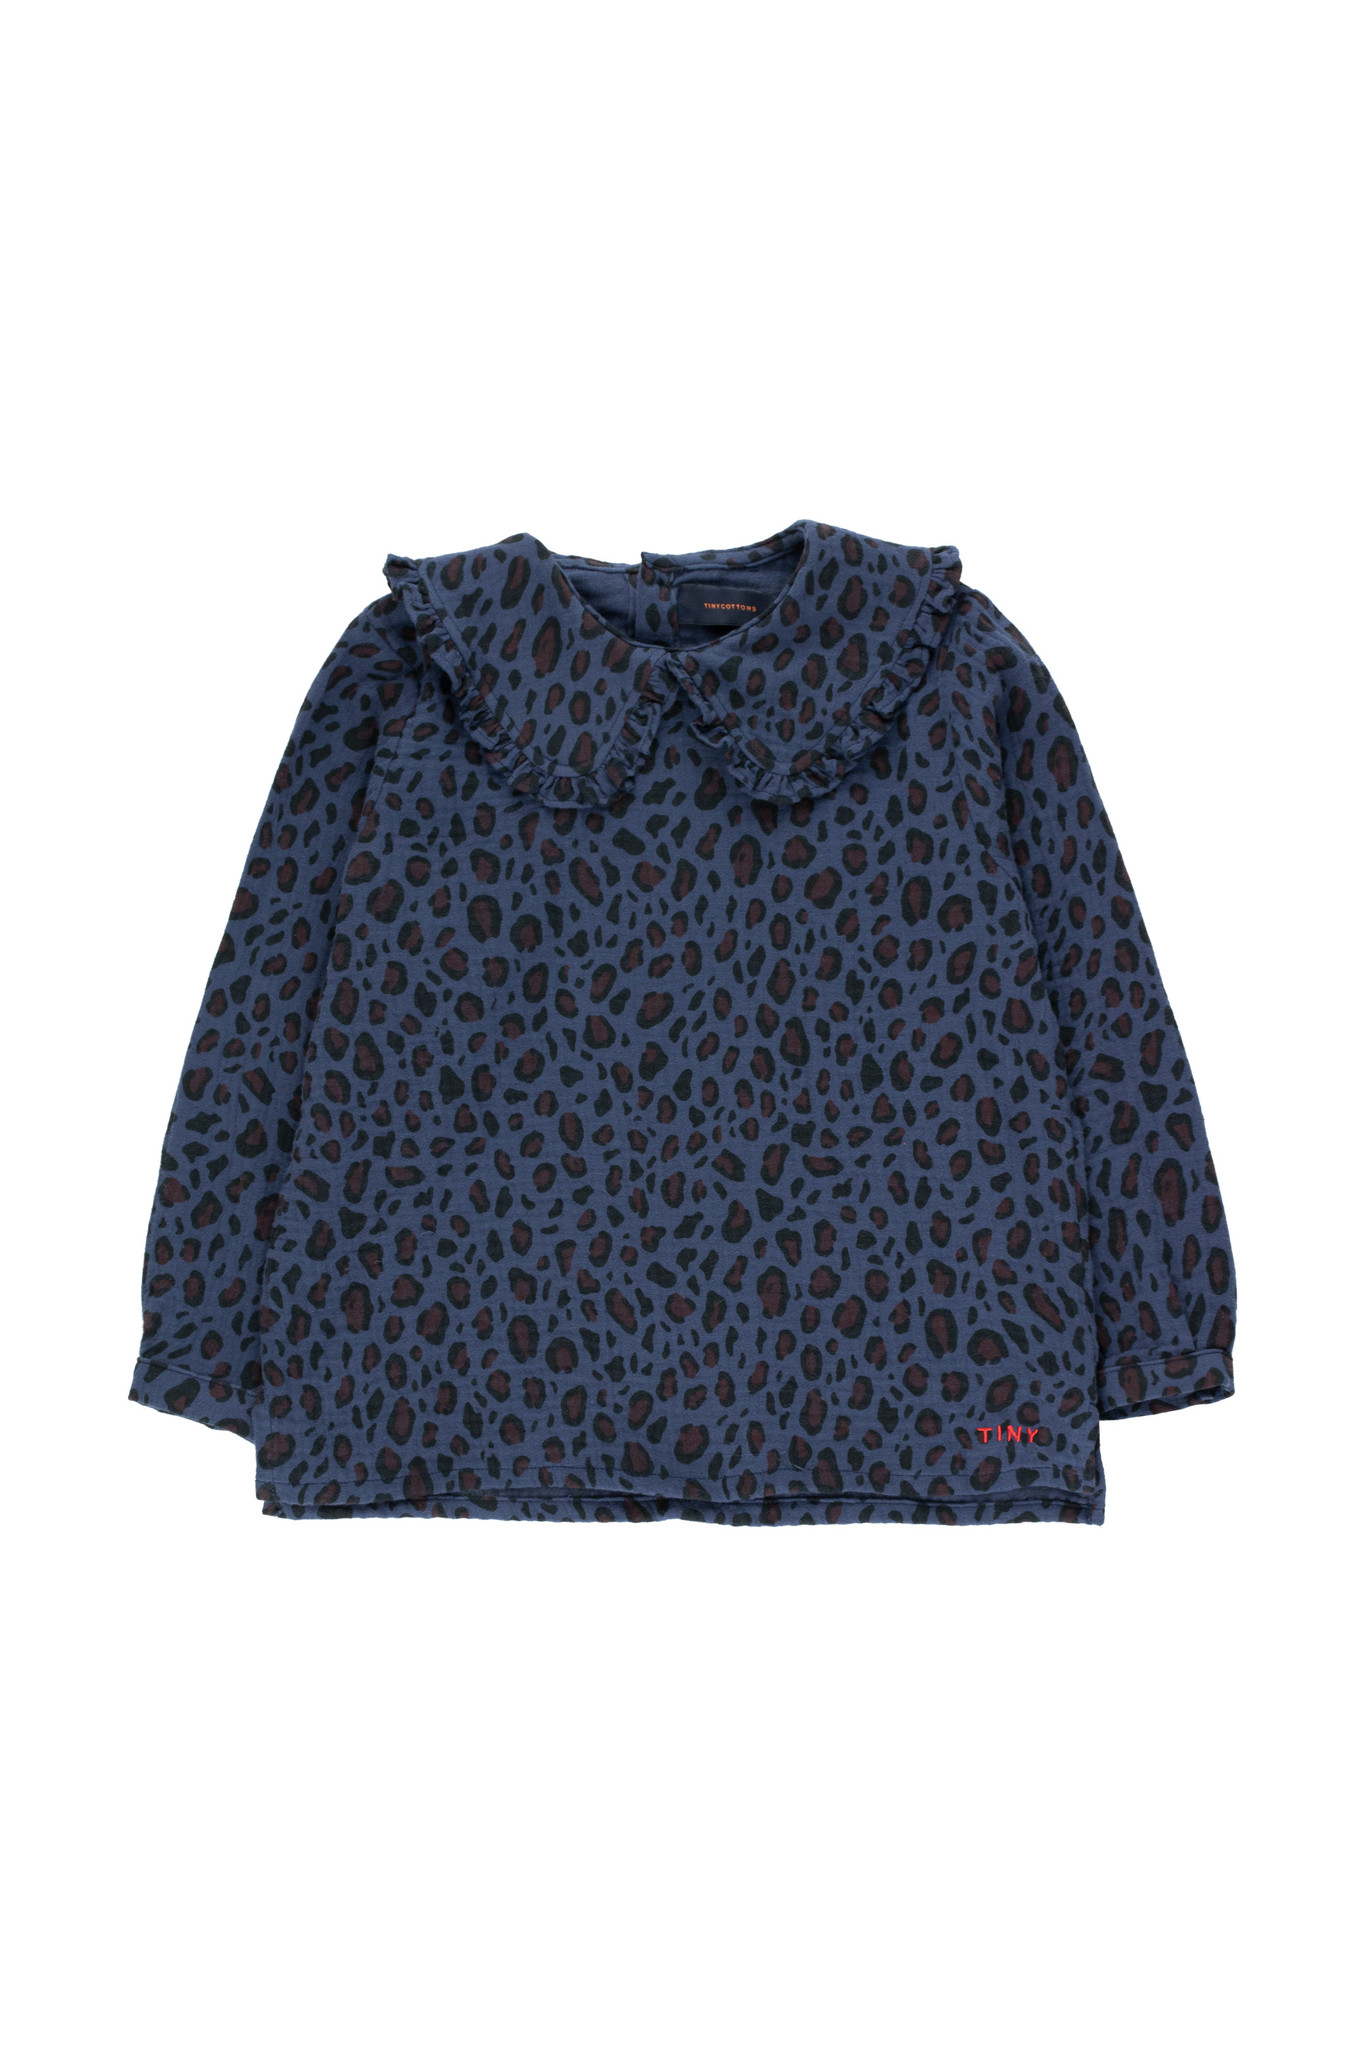 Animal print shirt - Light Navy / Dark Brown-1